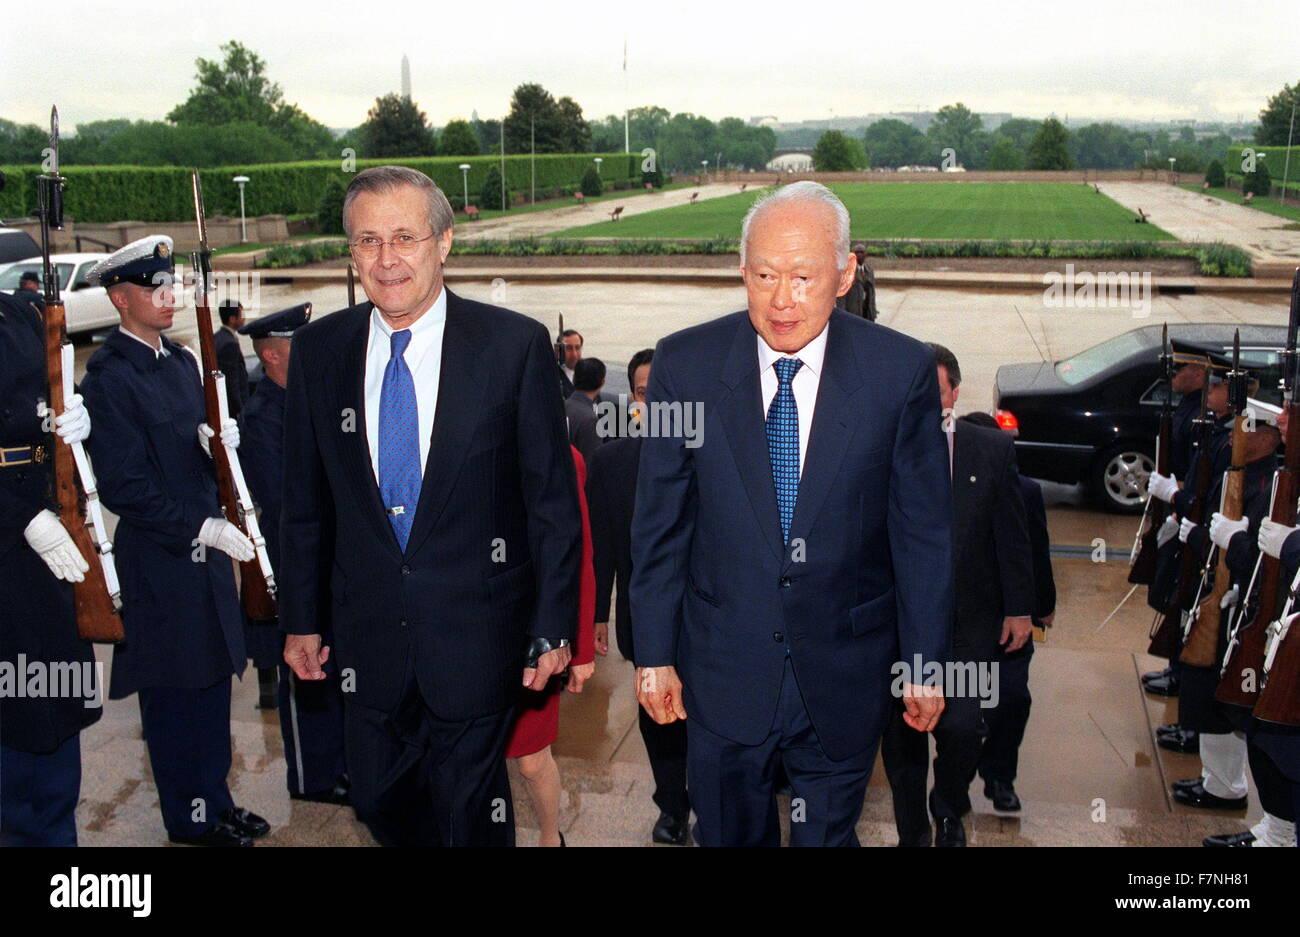 Photograph of Secretary of Defense Donald H. Rumsfeld (1932-) escorting Senior Minister Lee Kuan Yew (1923-2015) - Stock Image